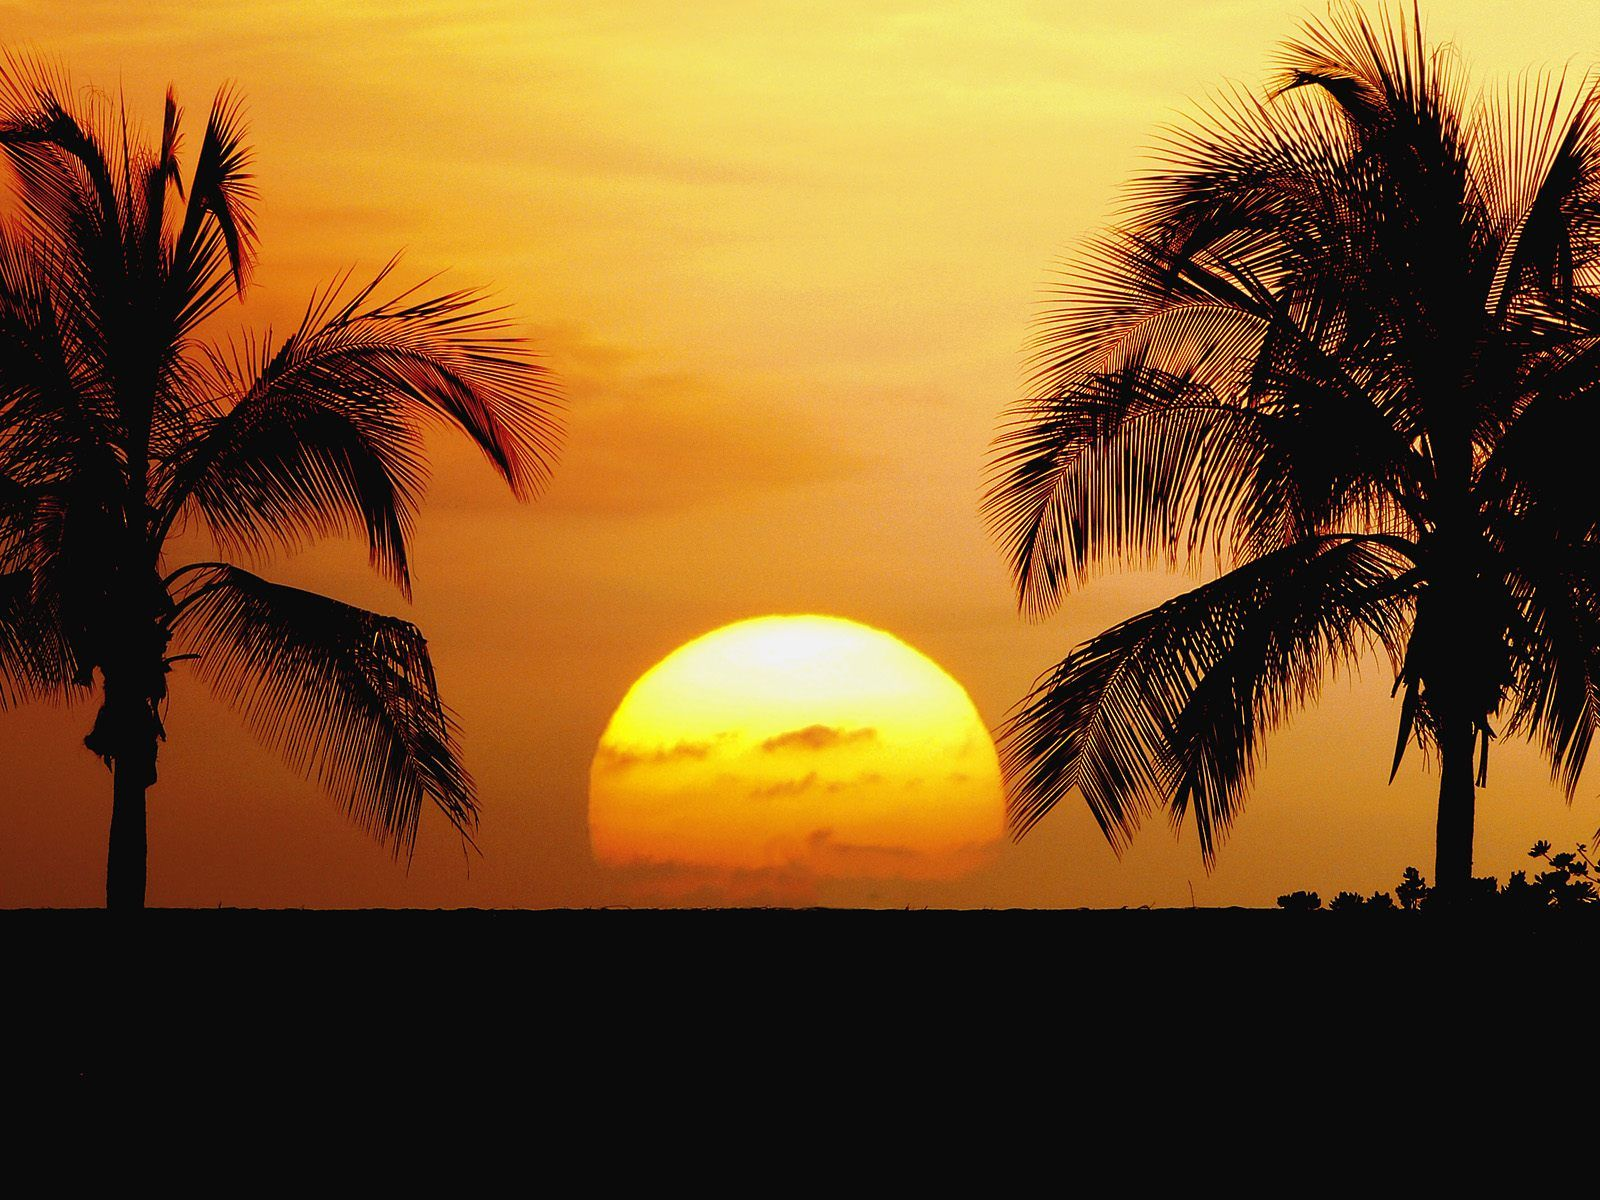 Hawaii Beach Sunset Wallpaper Wedding North Shore Oahu   Makes Your 1600x1200